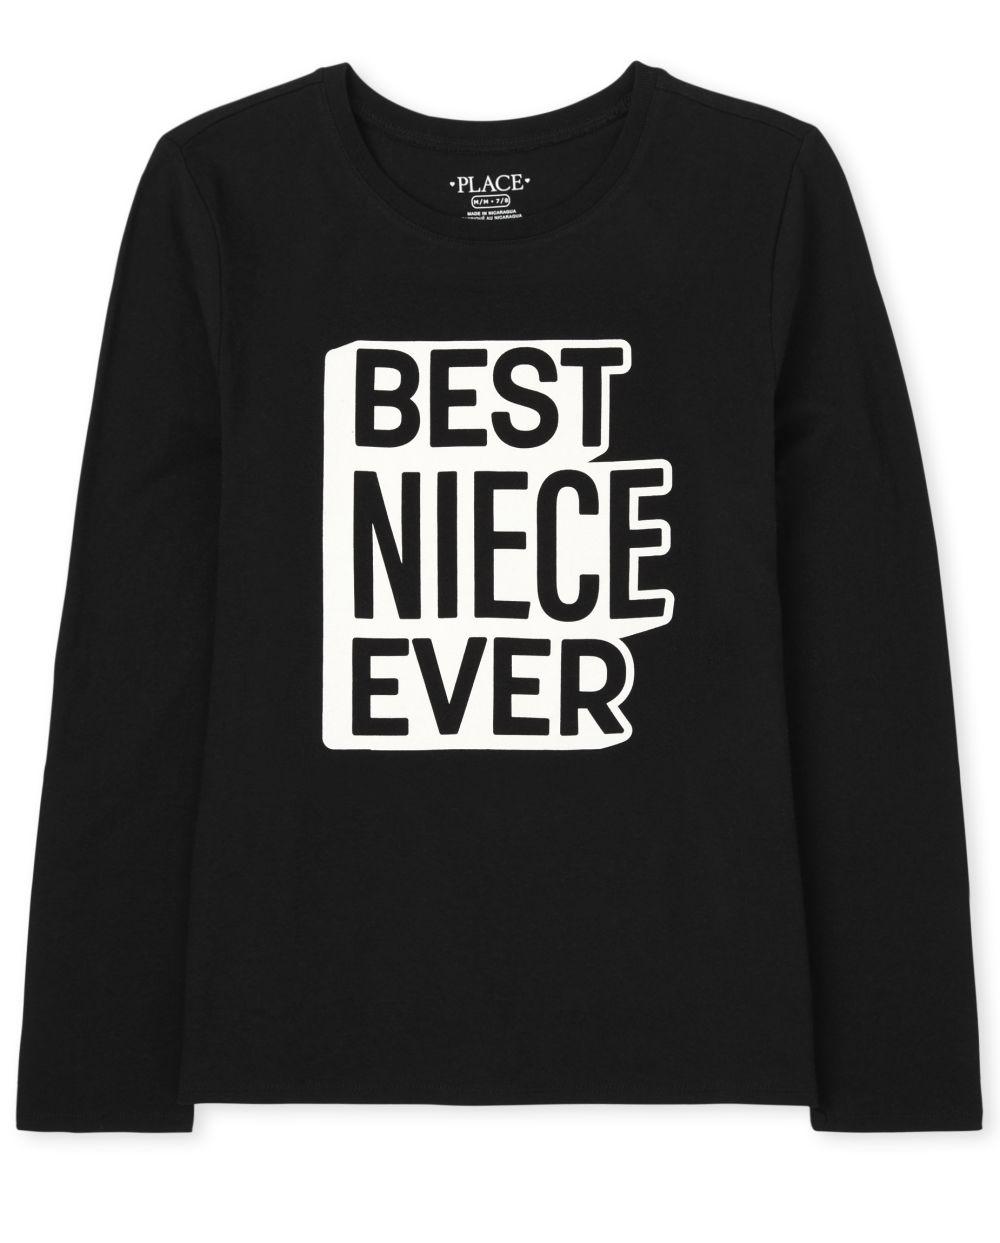 Matching Family Niece Graphic Tee - Black T-Shirt